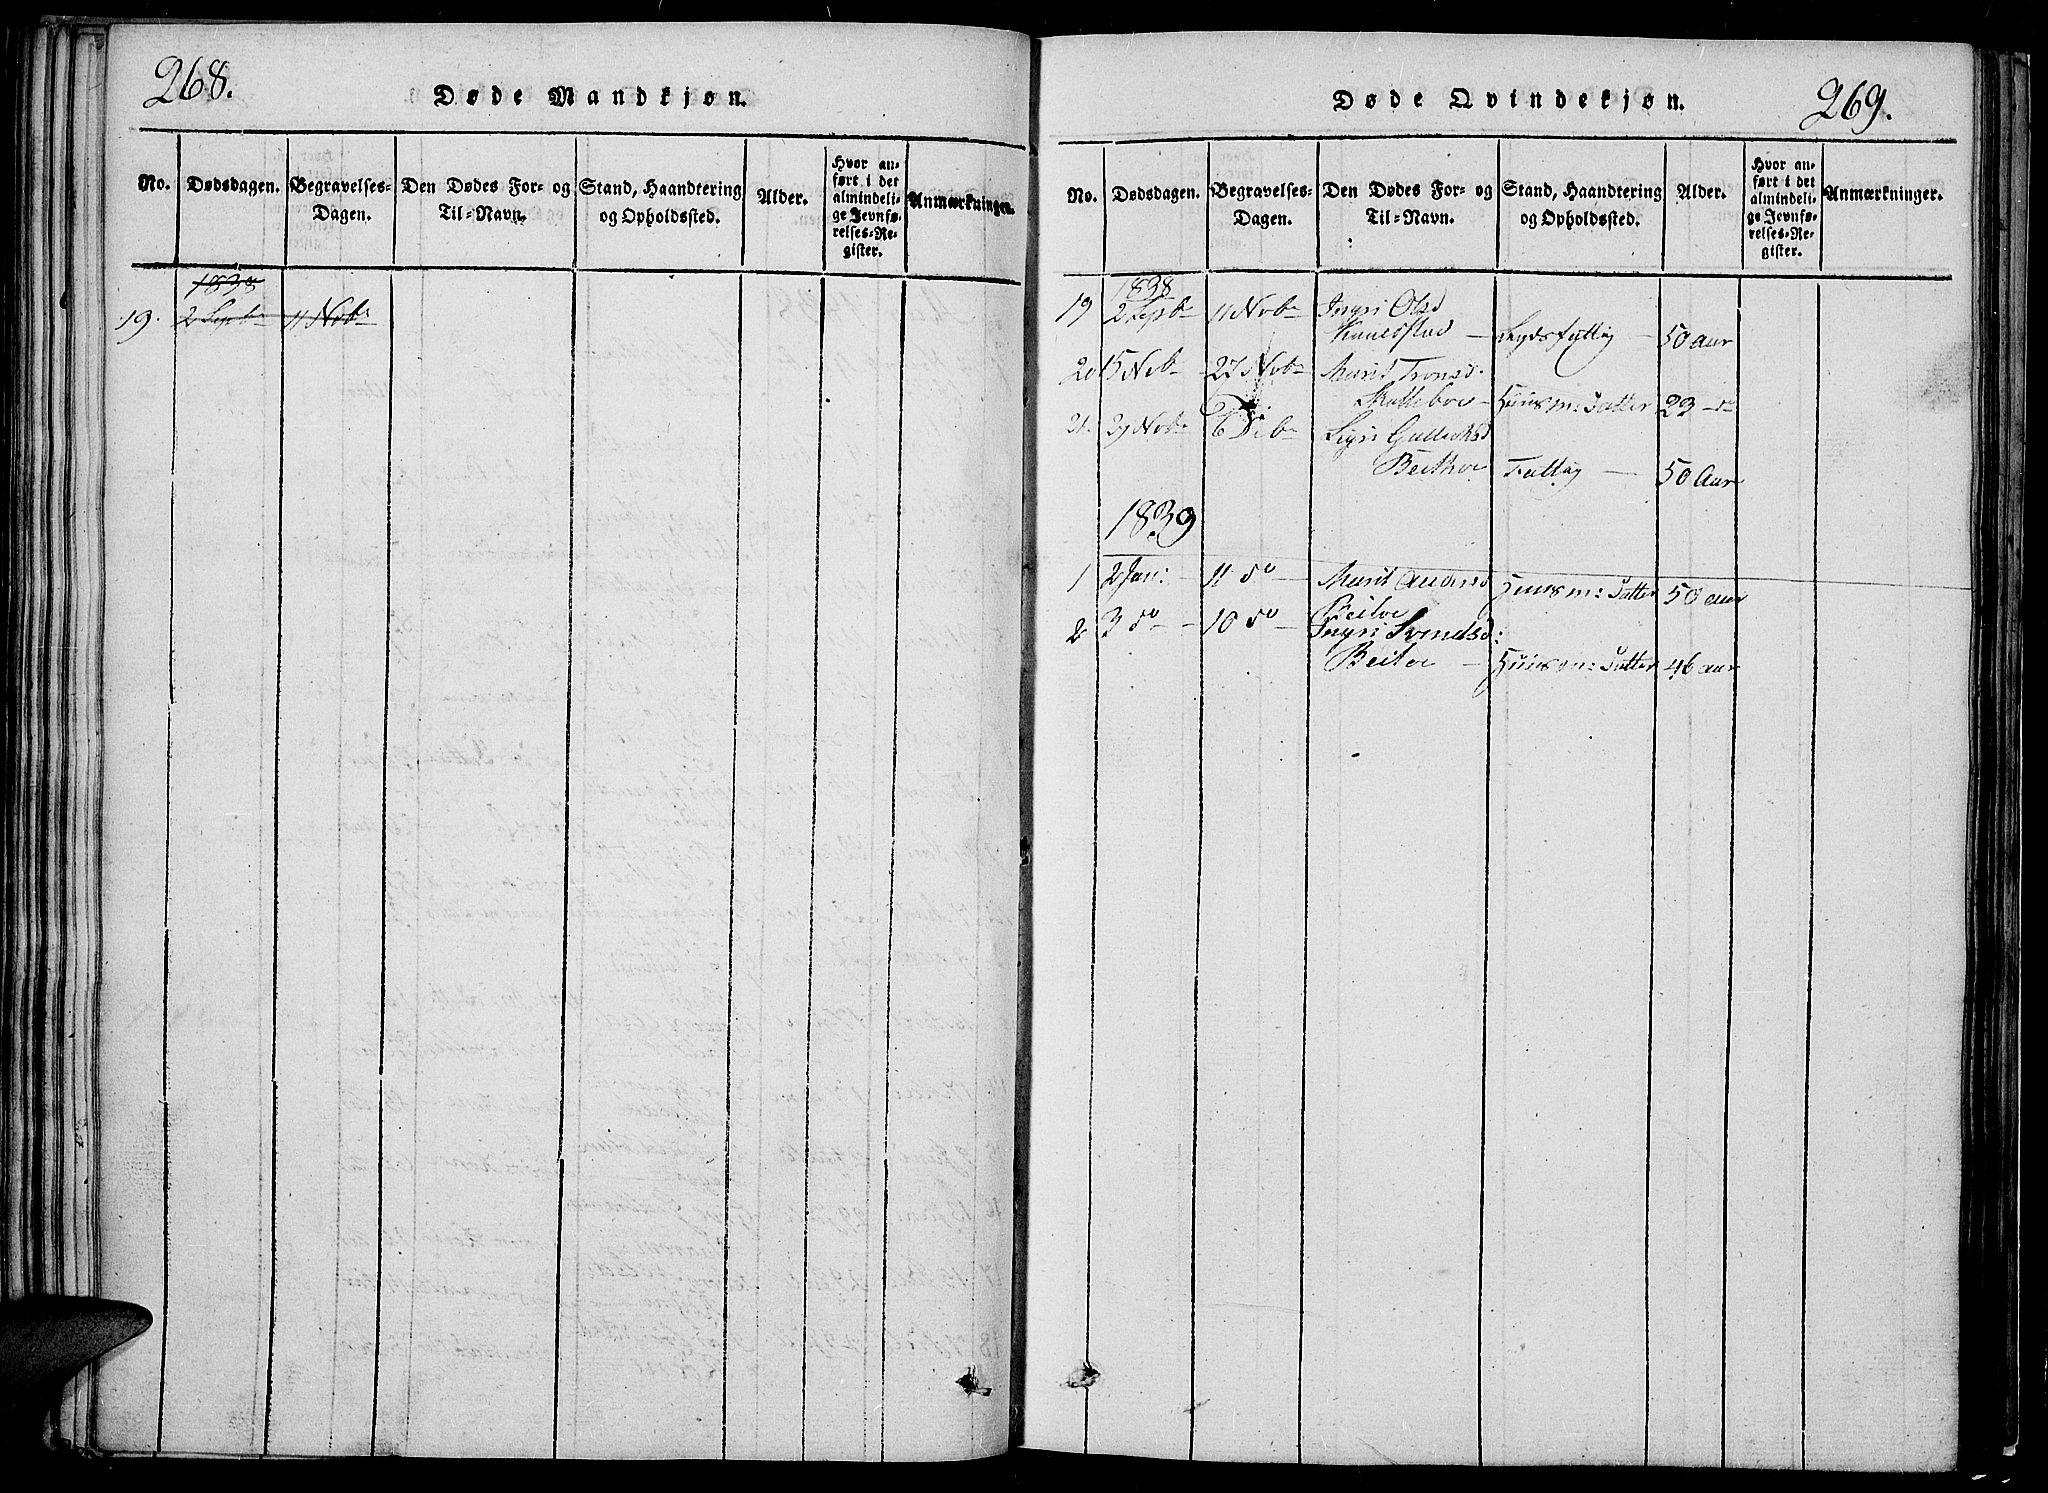 SAH, Slidre prestekontor, Klokkerbok nr. 2, 1814-1839, s. 268-269